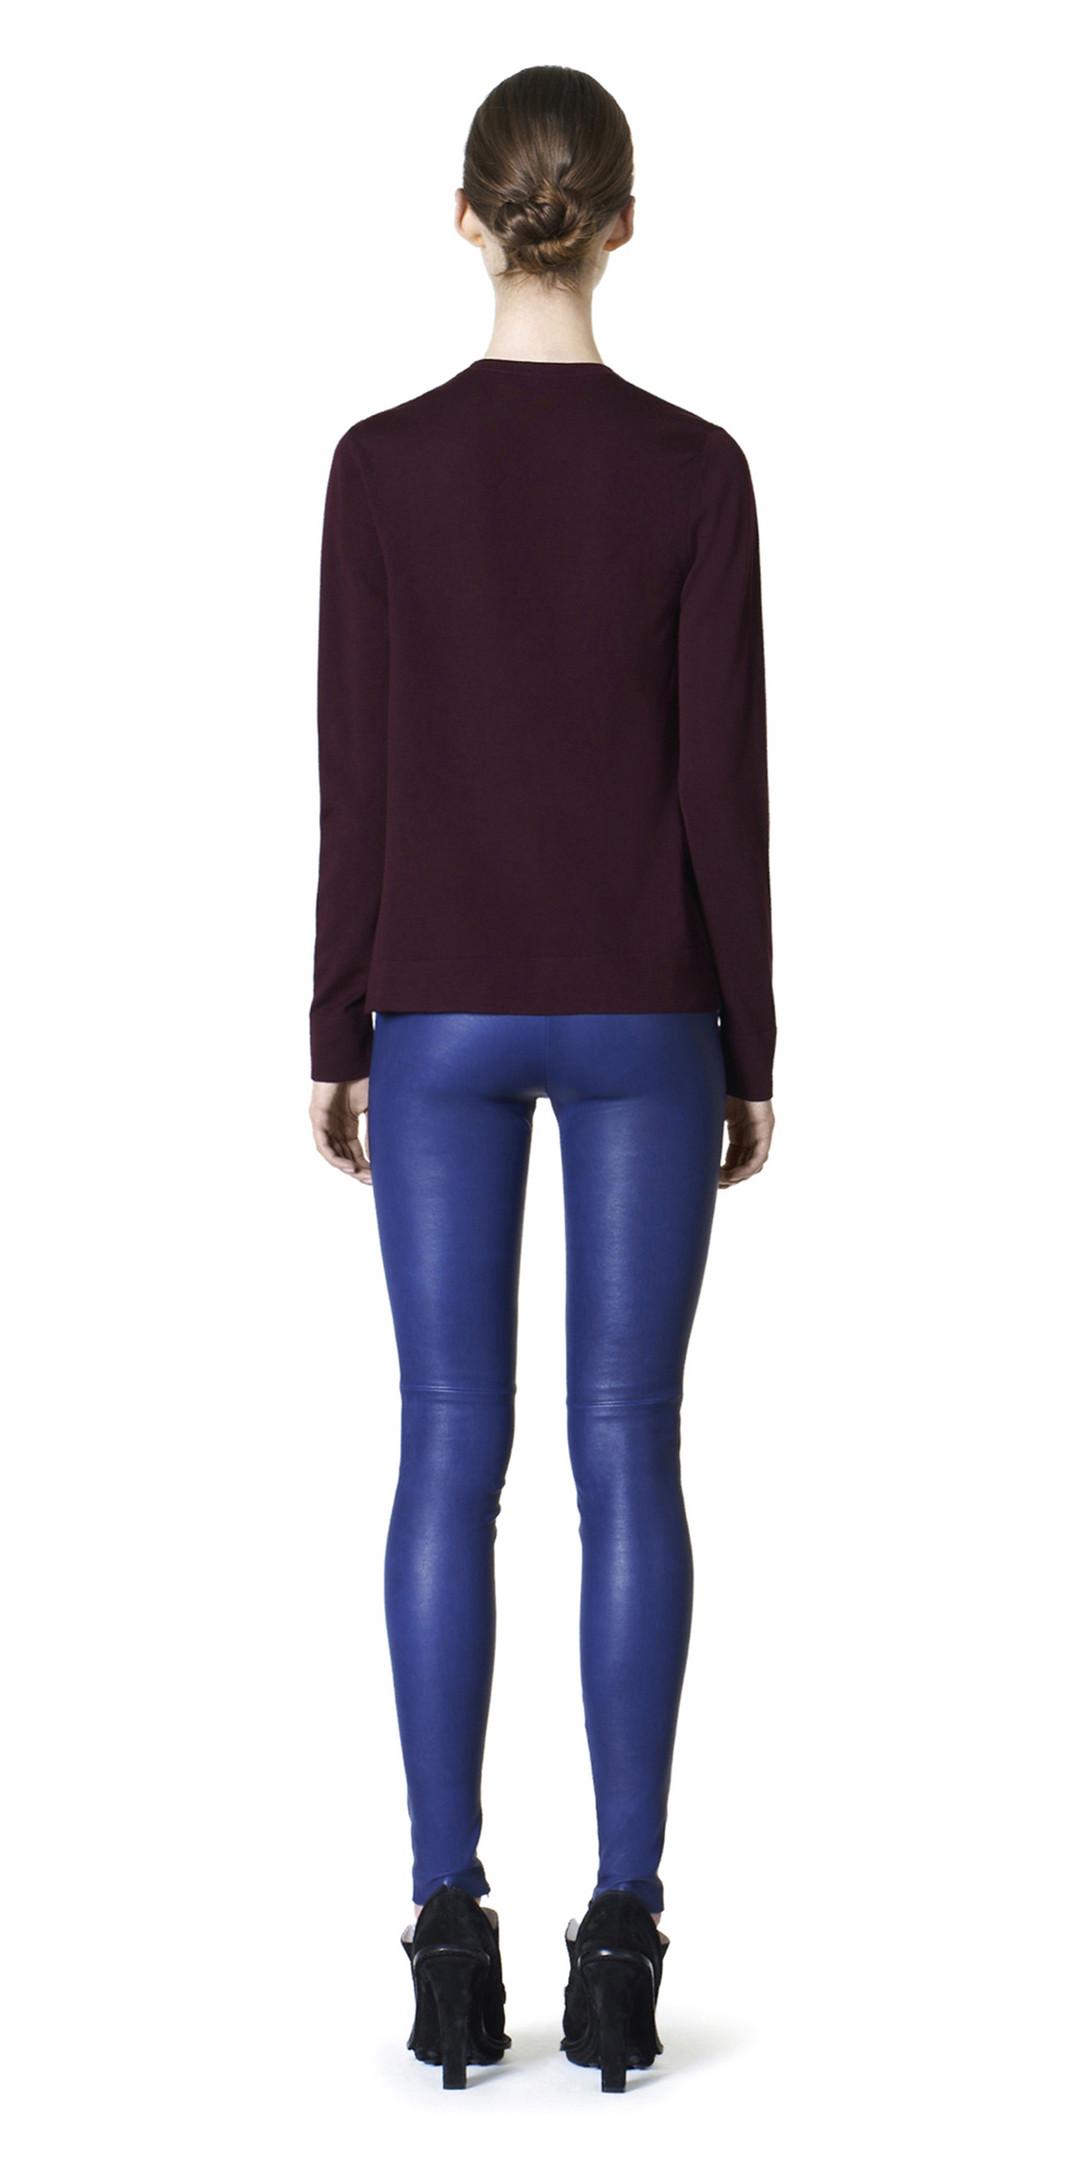 BALENCIAGA Trousers D Balenciaga Slim Stretch Leather Trousers i